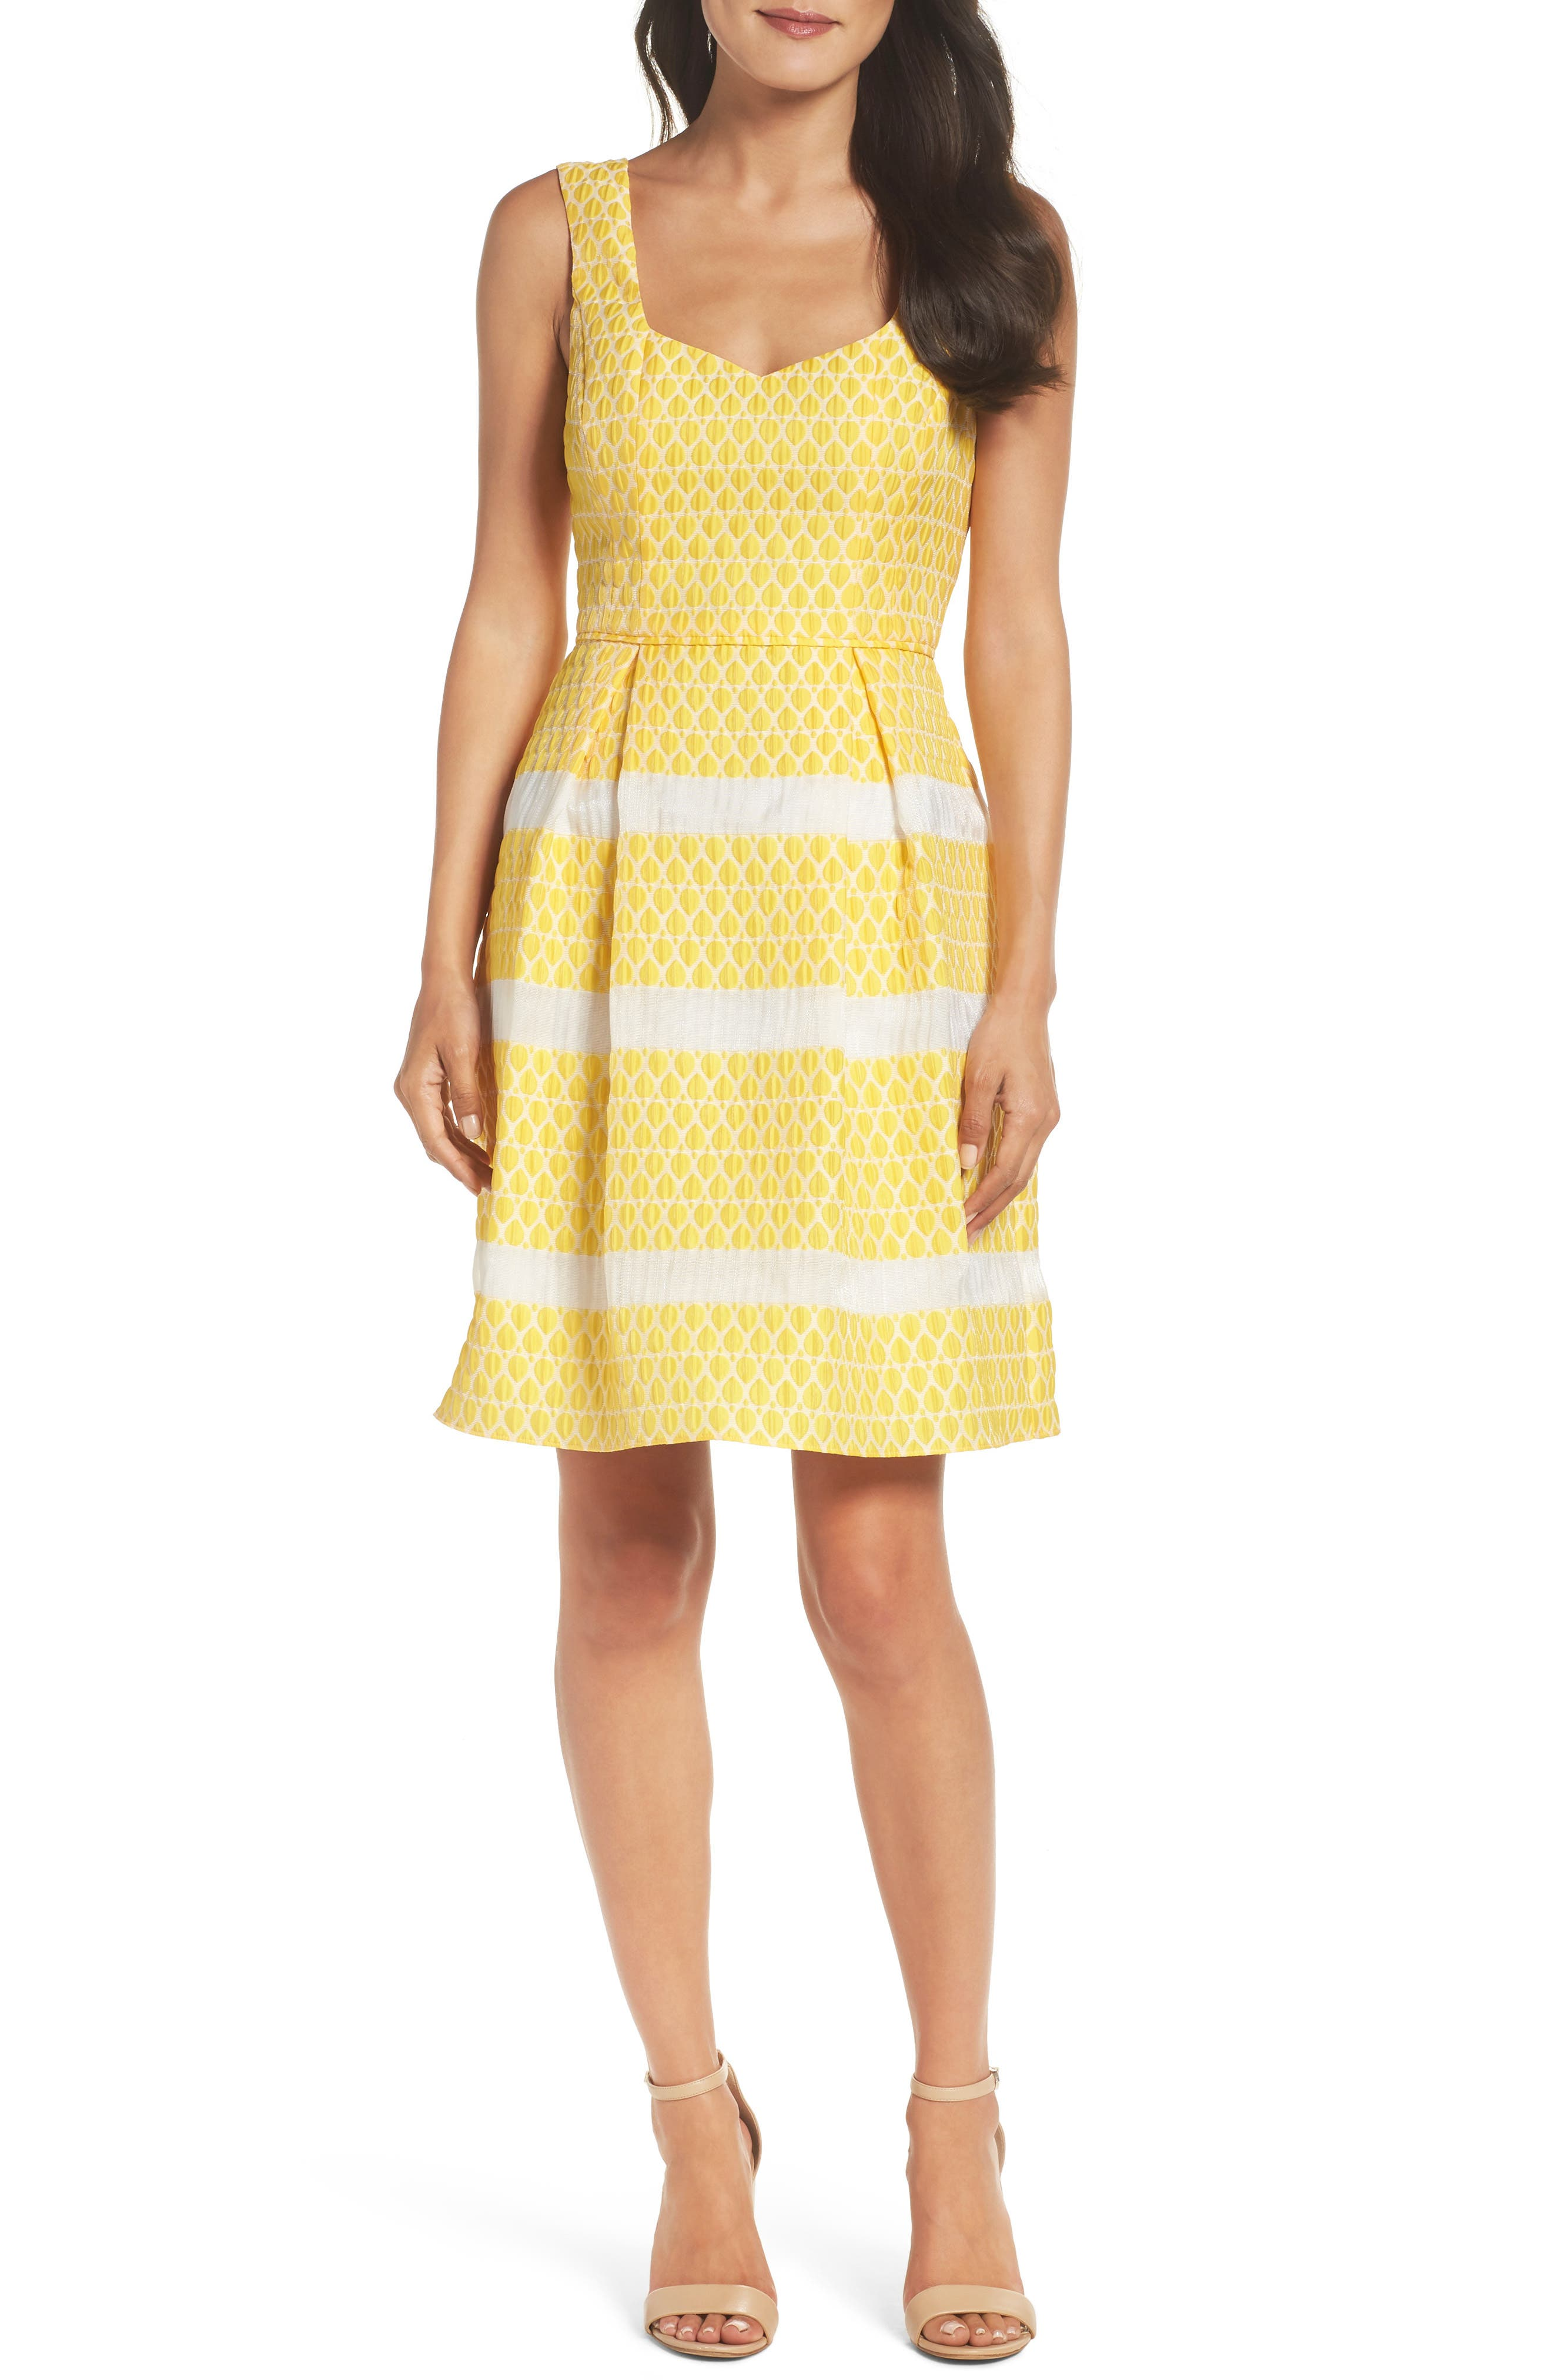 Adrianna Papell Lemon Drop Jacquard Fit & Flare Dress (Regular & Petite)